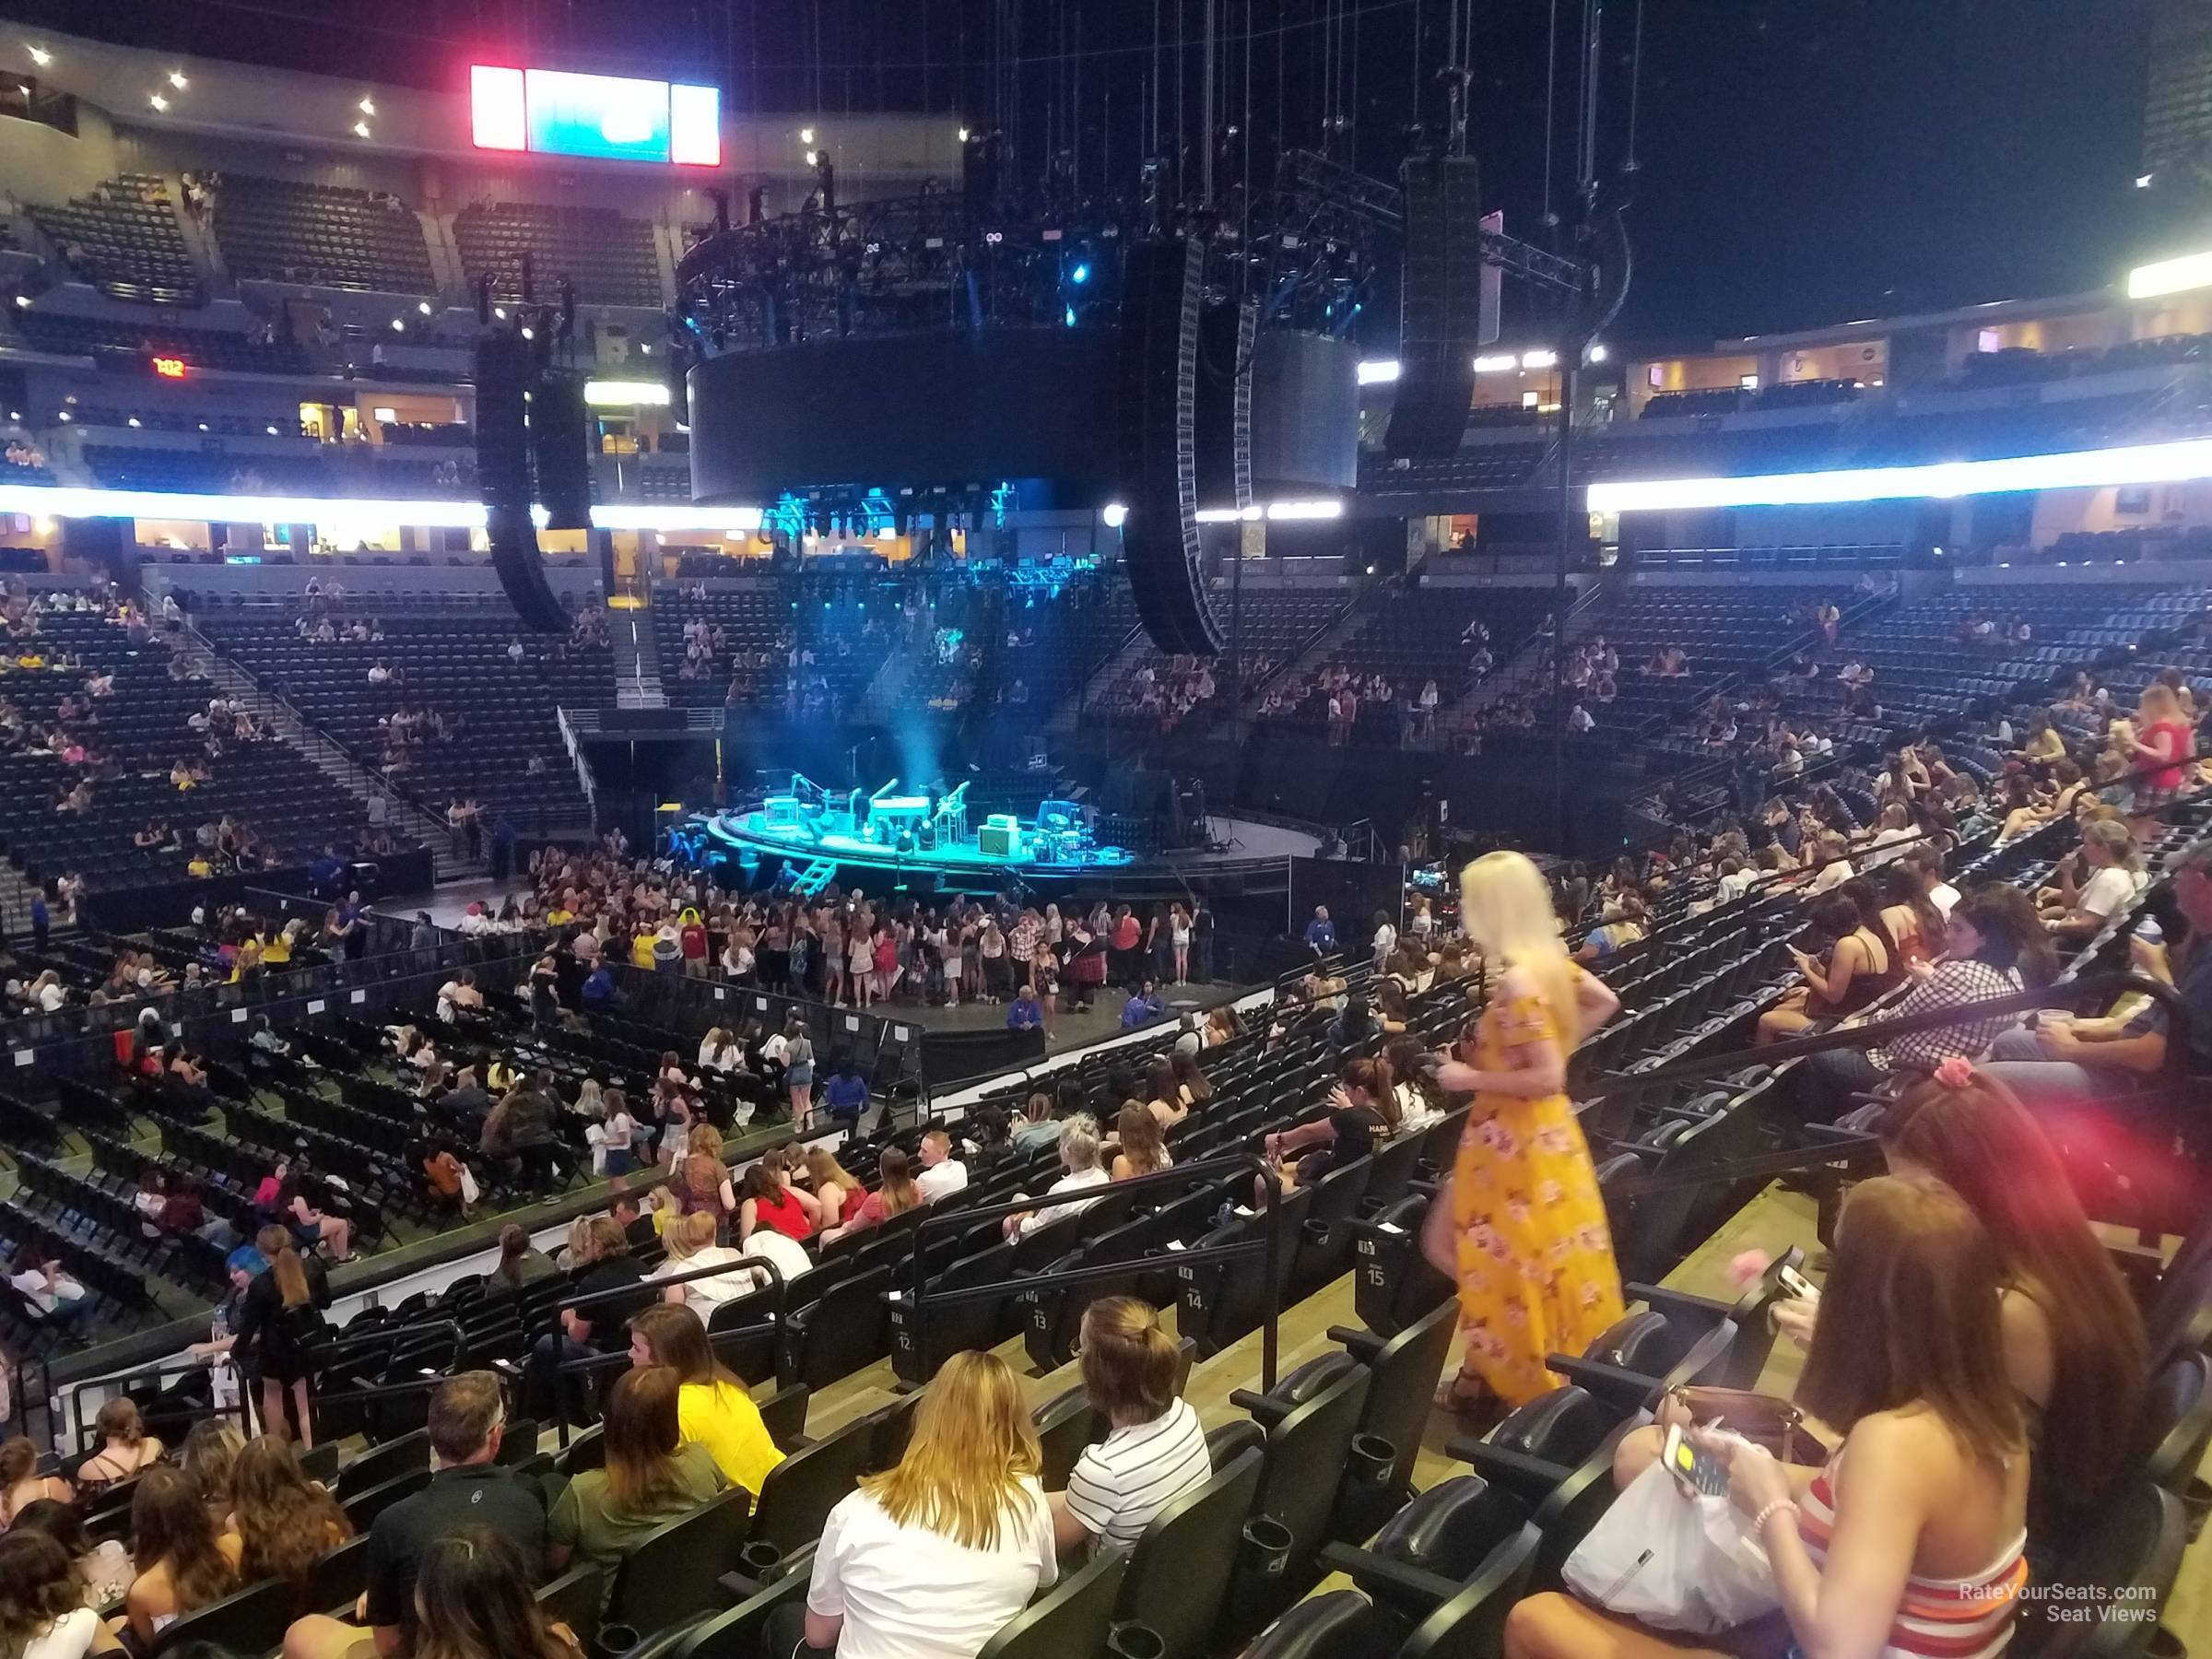 Pepsi Center Section 102 Concert Seating Rateyourseatscom